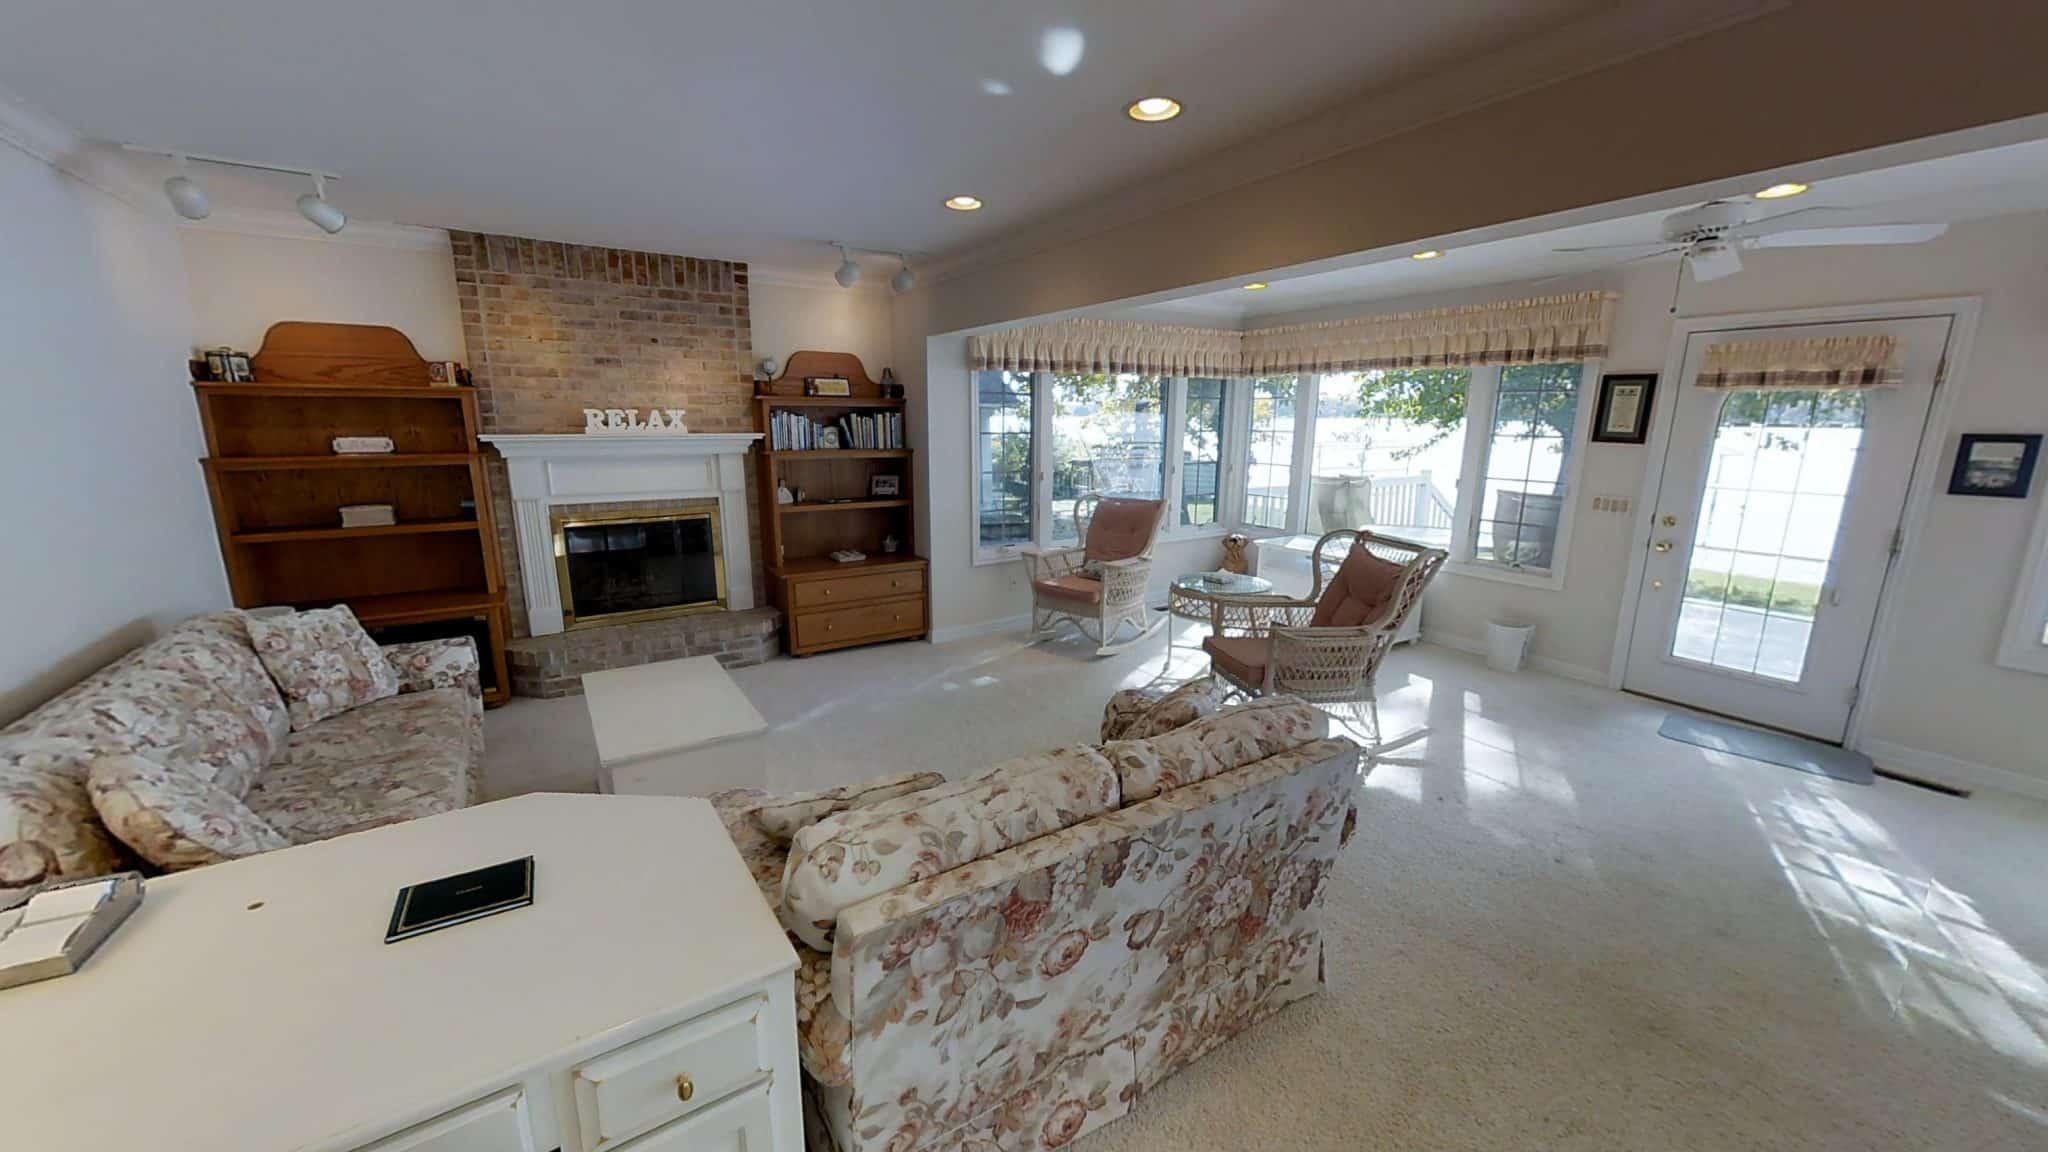 Peter Living Room